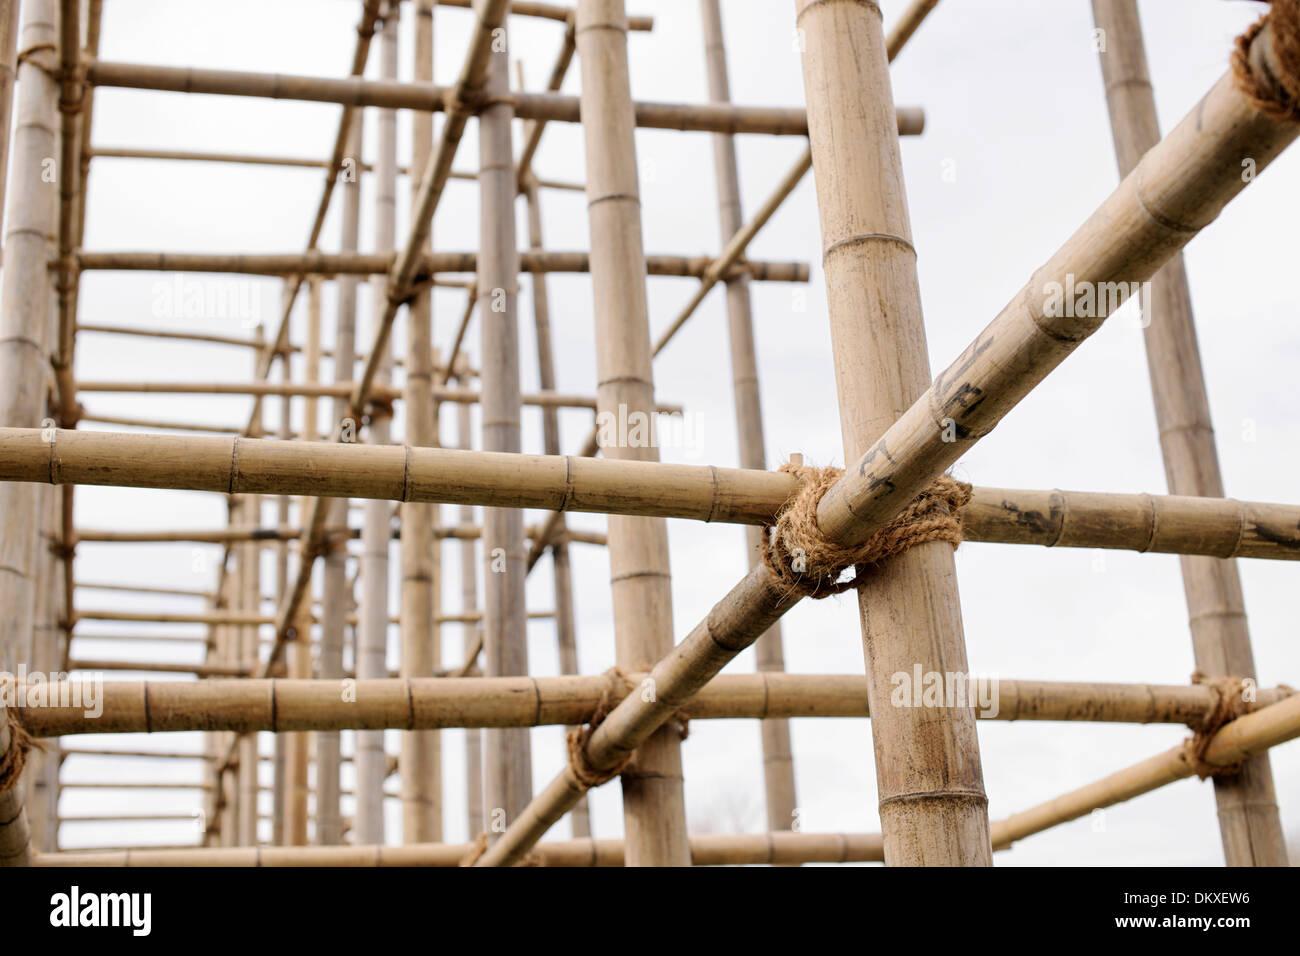 Bamboo scaffolding, IGS, International Garden Show, Wilhelmsburg, Hamburg, Germany - Stock Image